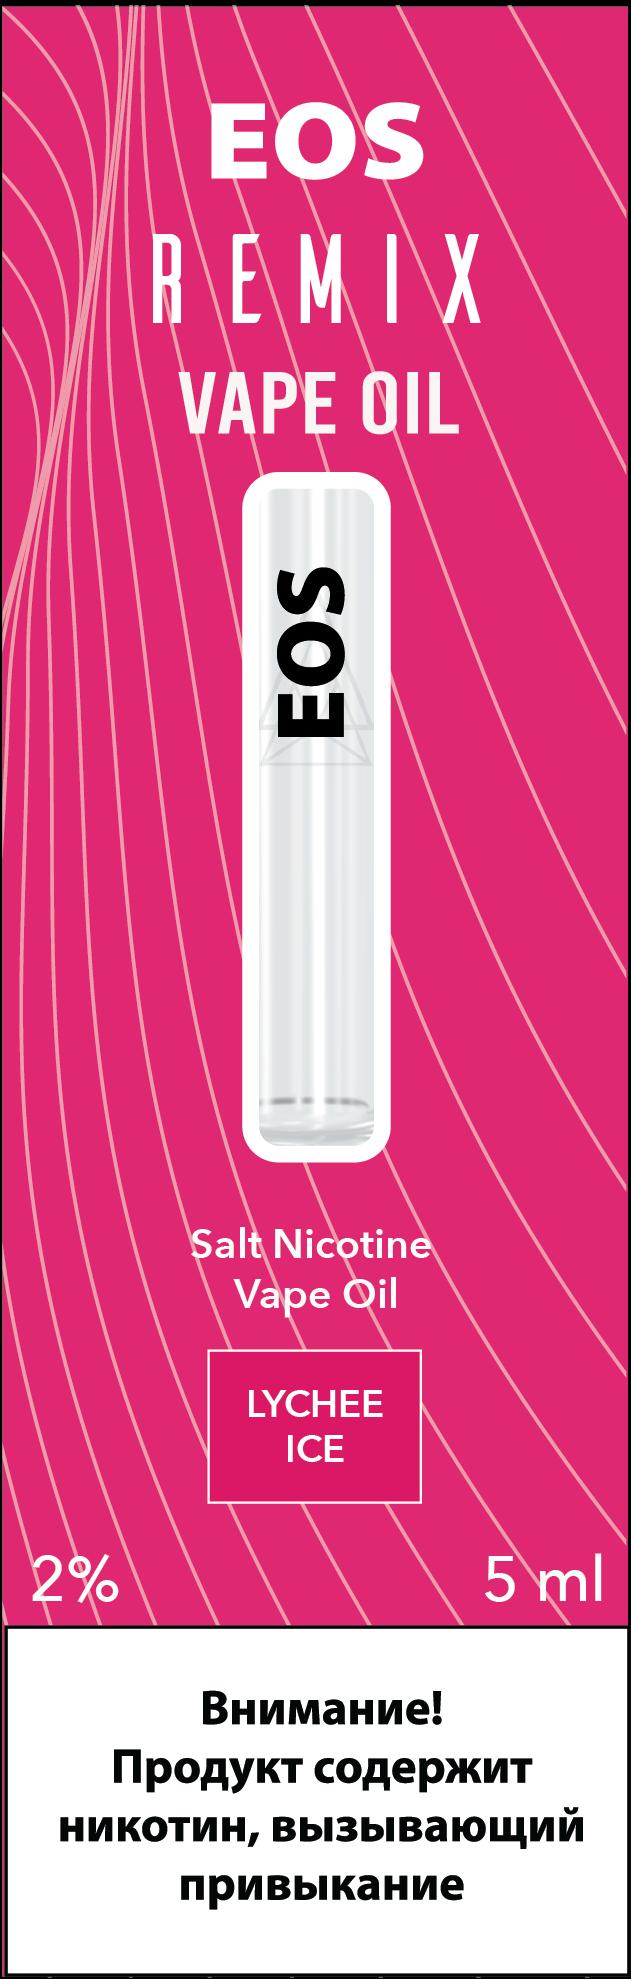 EOS REMIX SALT NIC LYCHEE ICE 2% 5ml